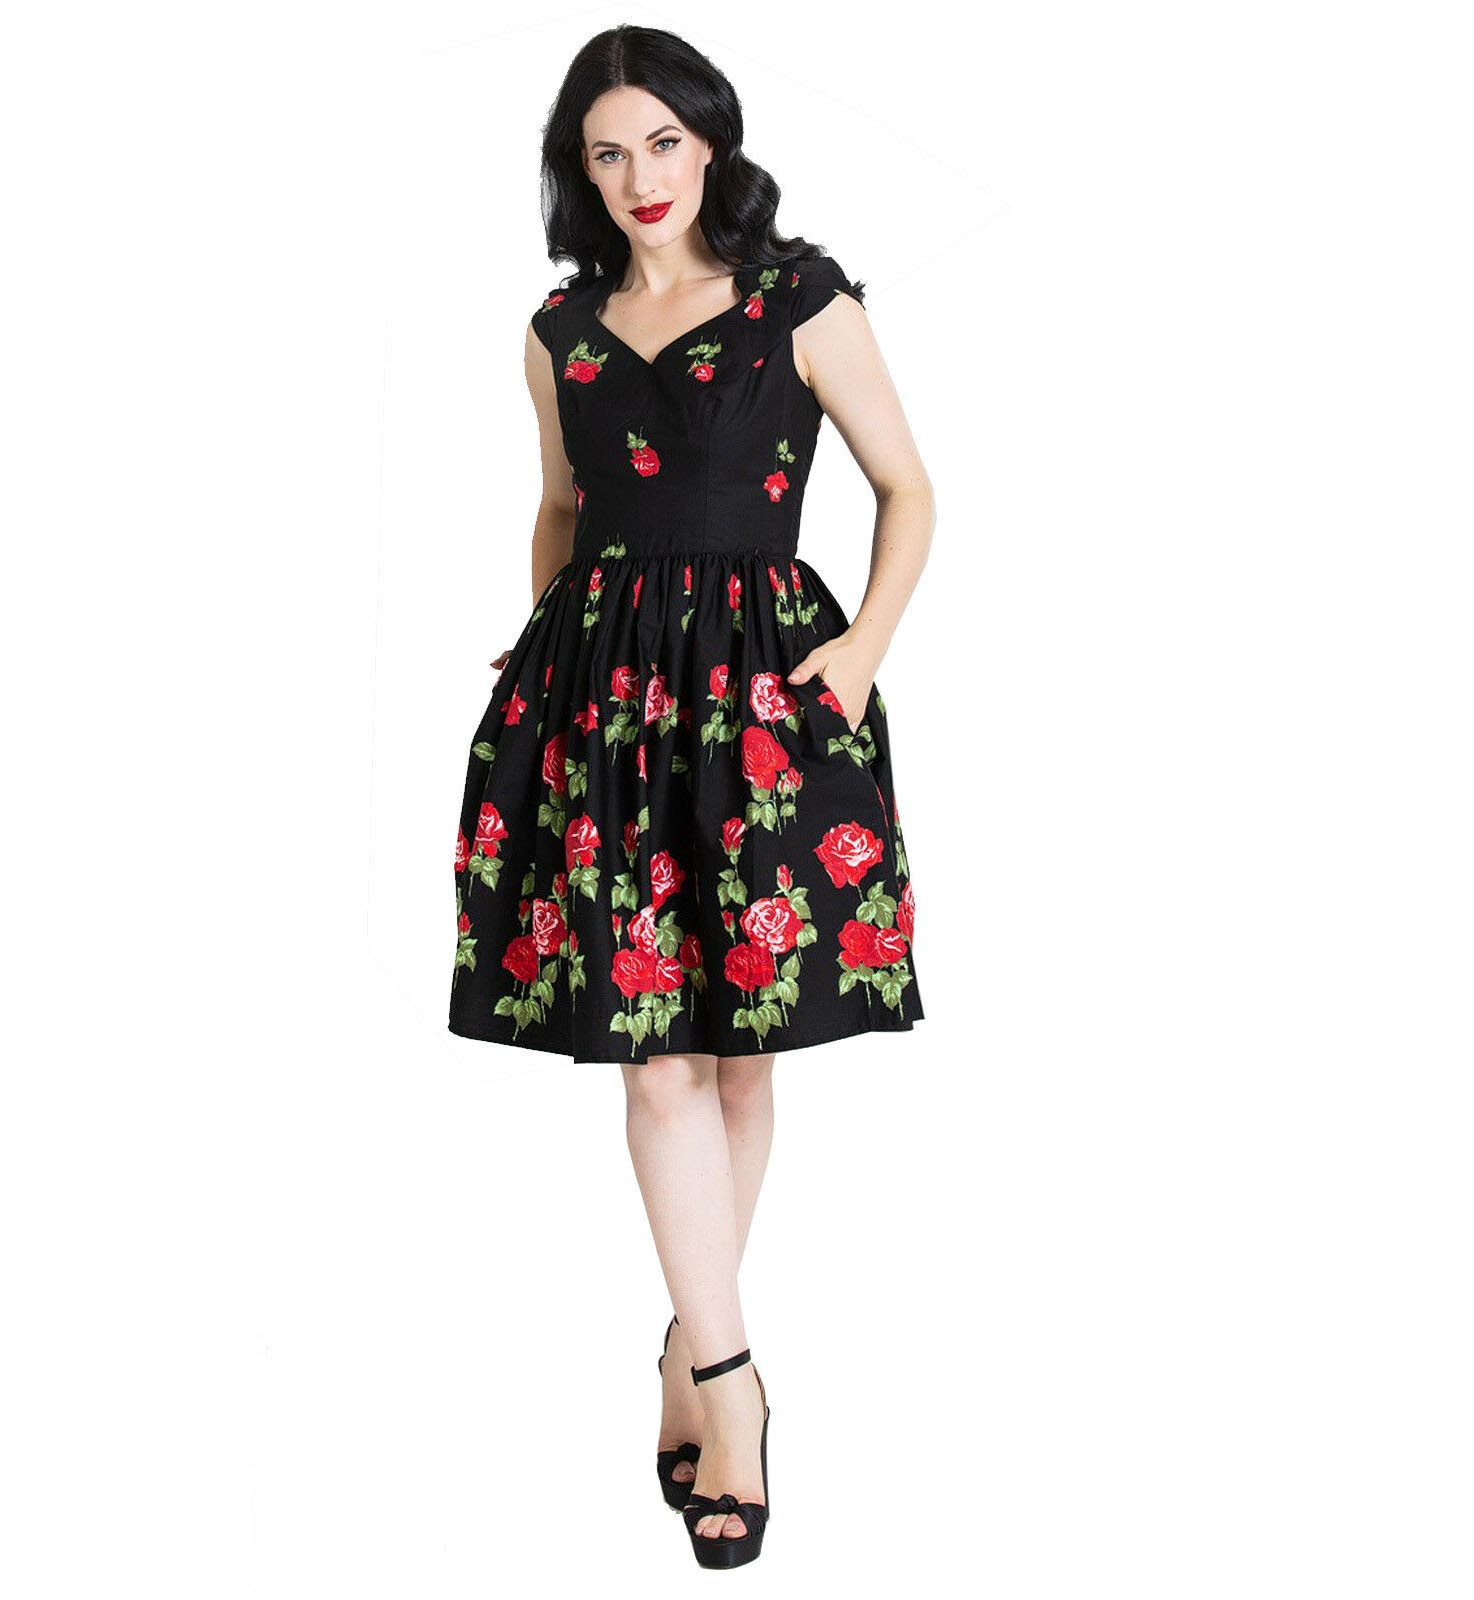 Hell-Bunny-Pin-Up-Mid-Length-50s-Dress-ANTONIA-Rose-Floral-Black thumbnail 19